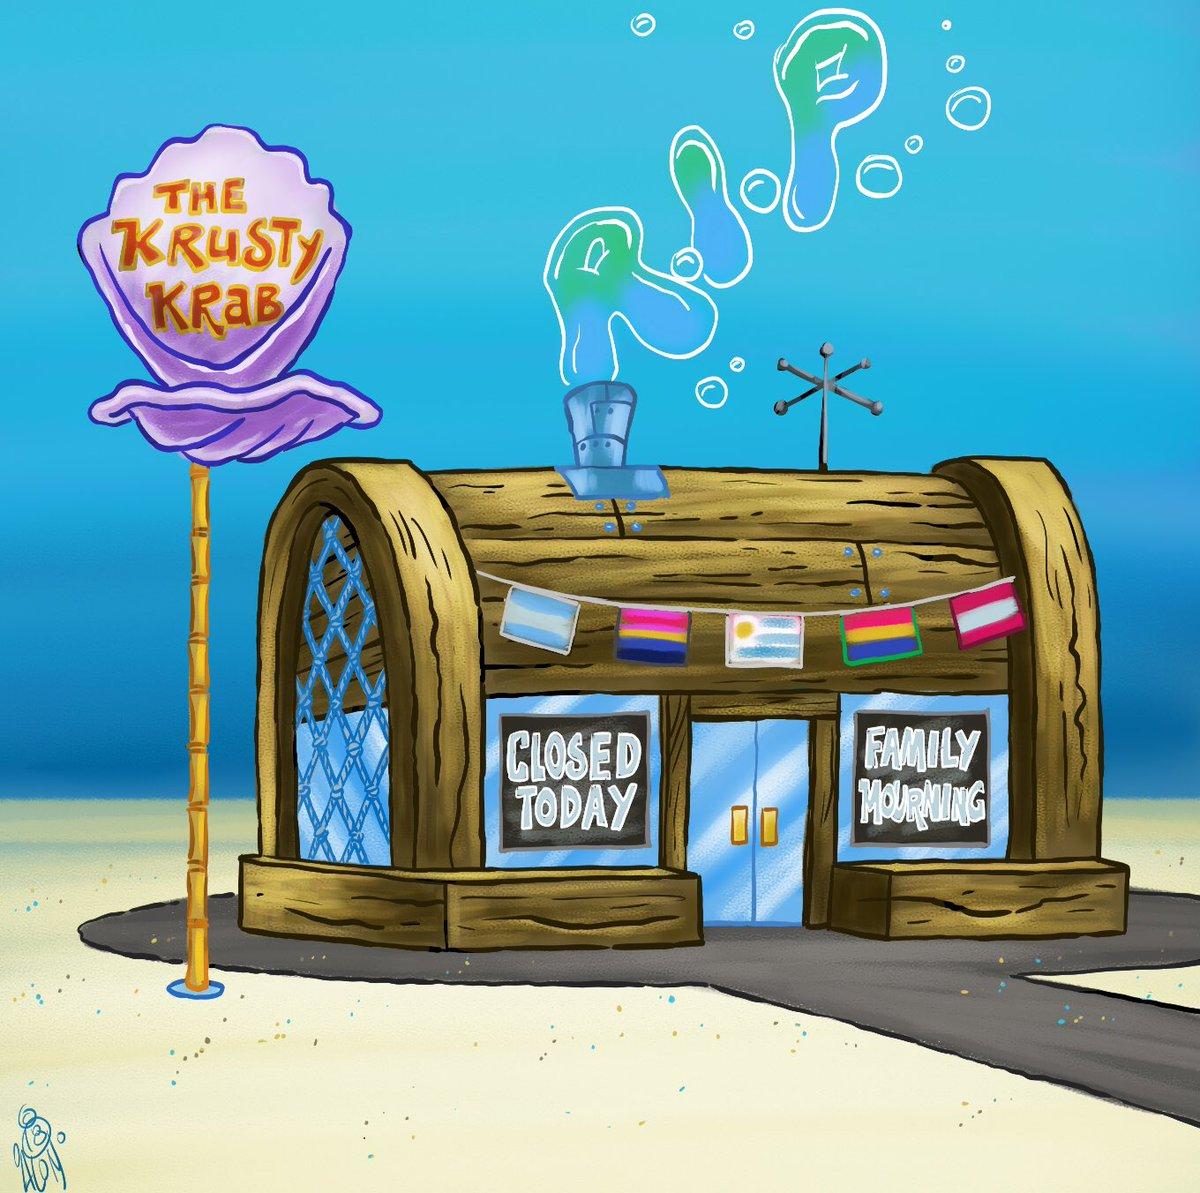 Spongebob squarepants the krusty krab is closed